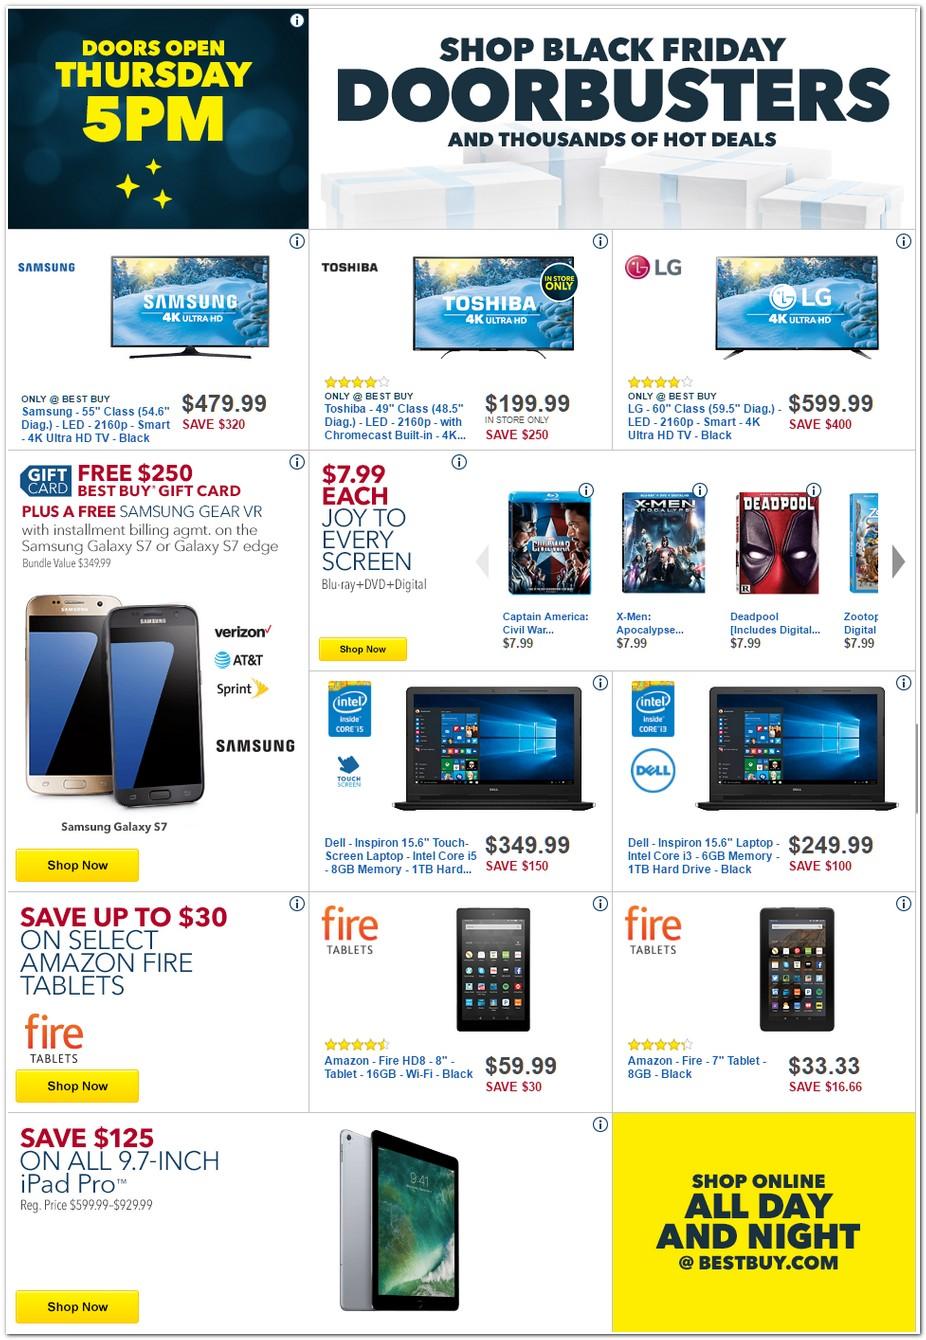 Best Buy Black Friday 2016 Ad Iphone 7 Ps4 Pro Bundle